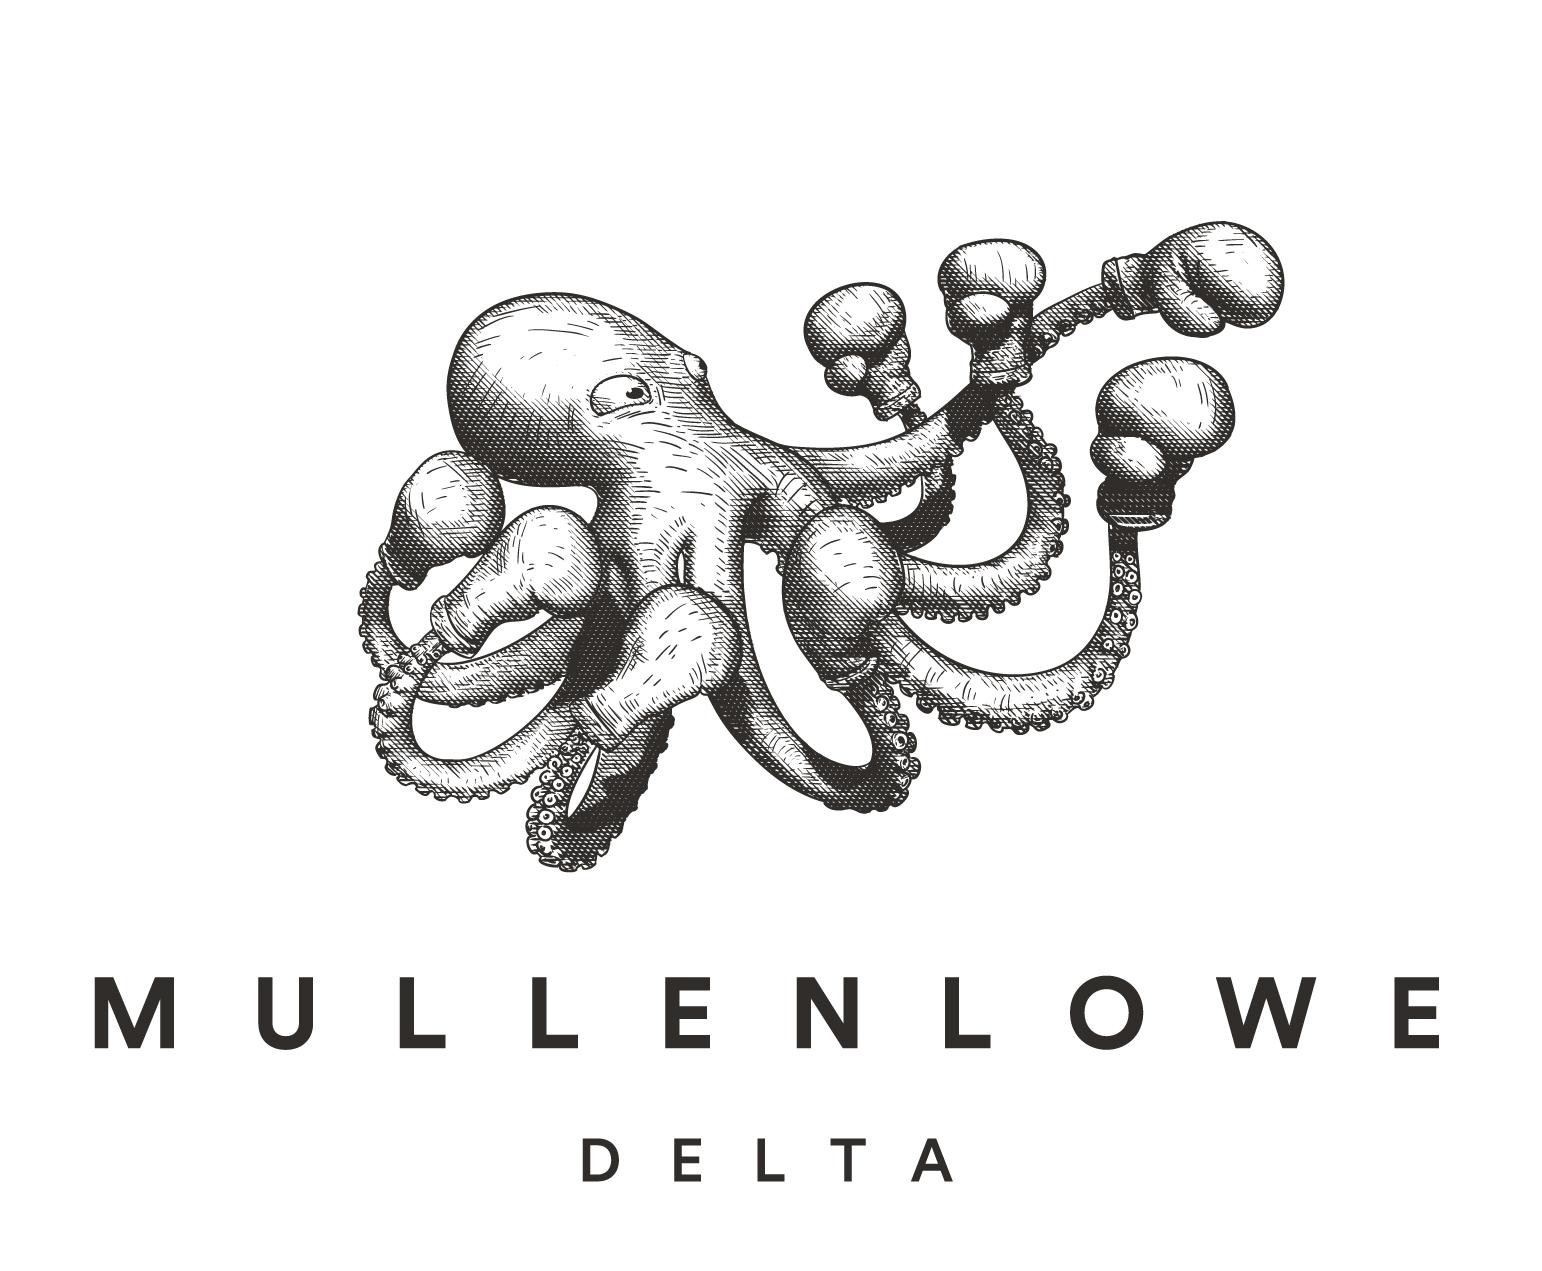 Mullenlowe_Lockup_K_Delta